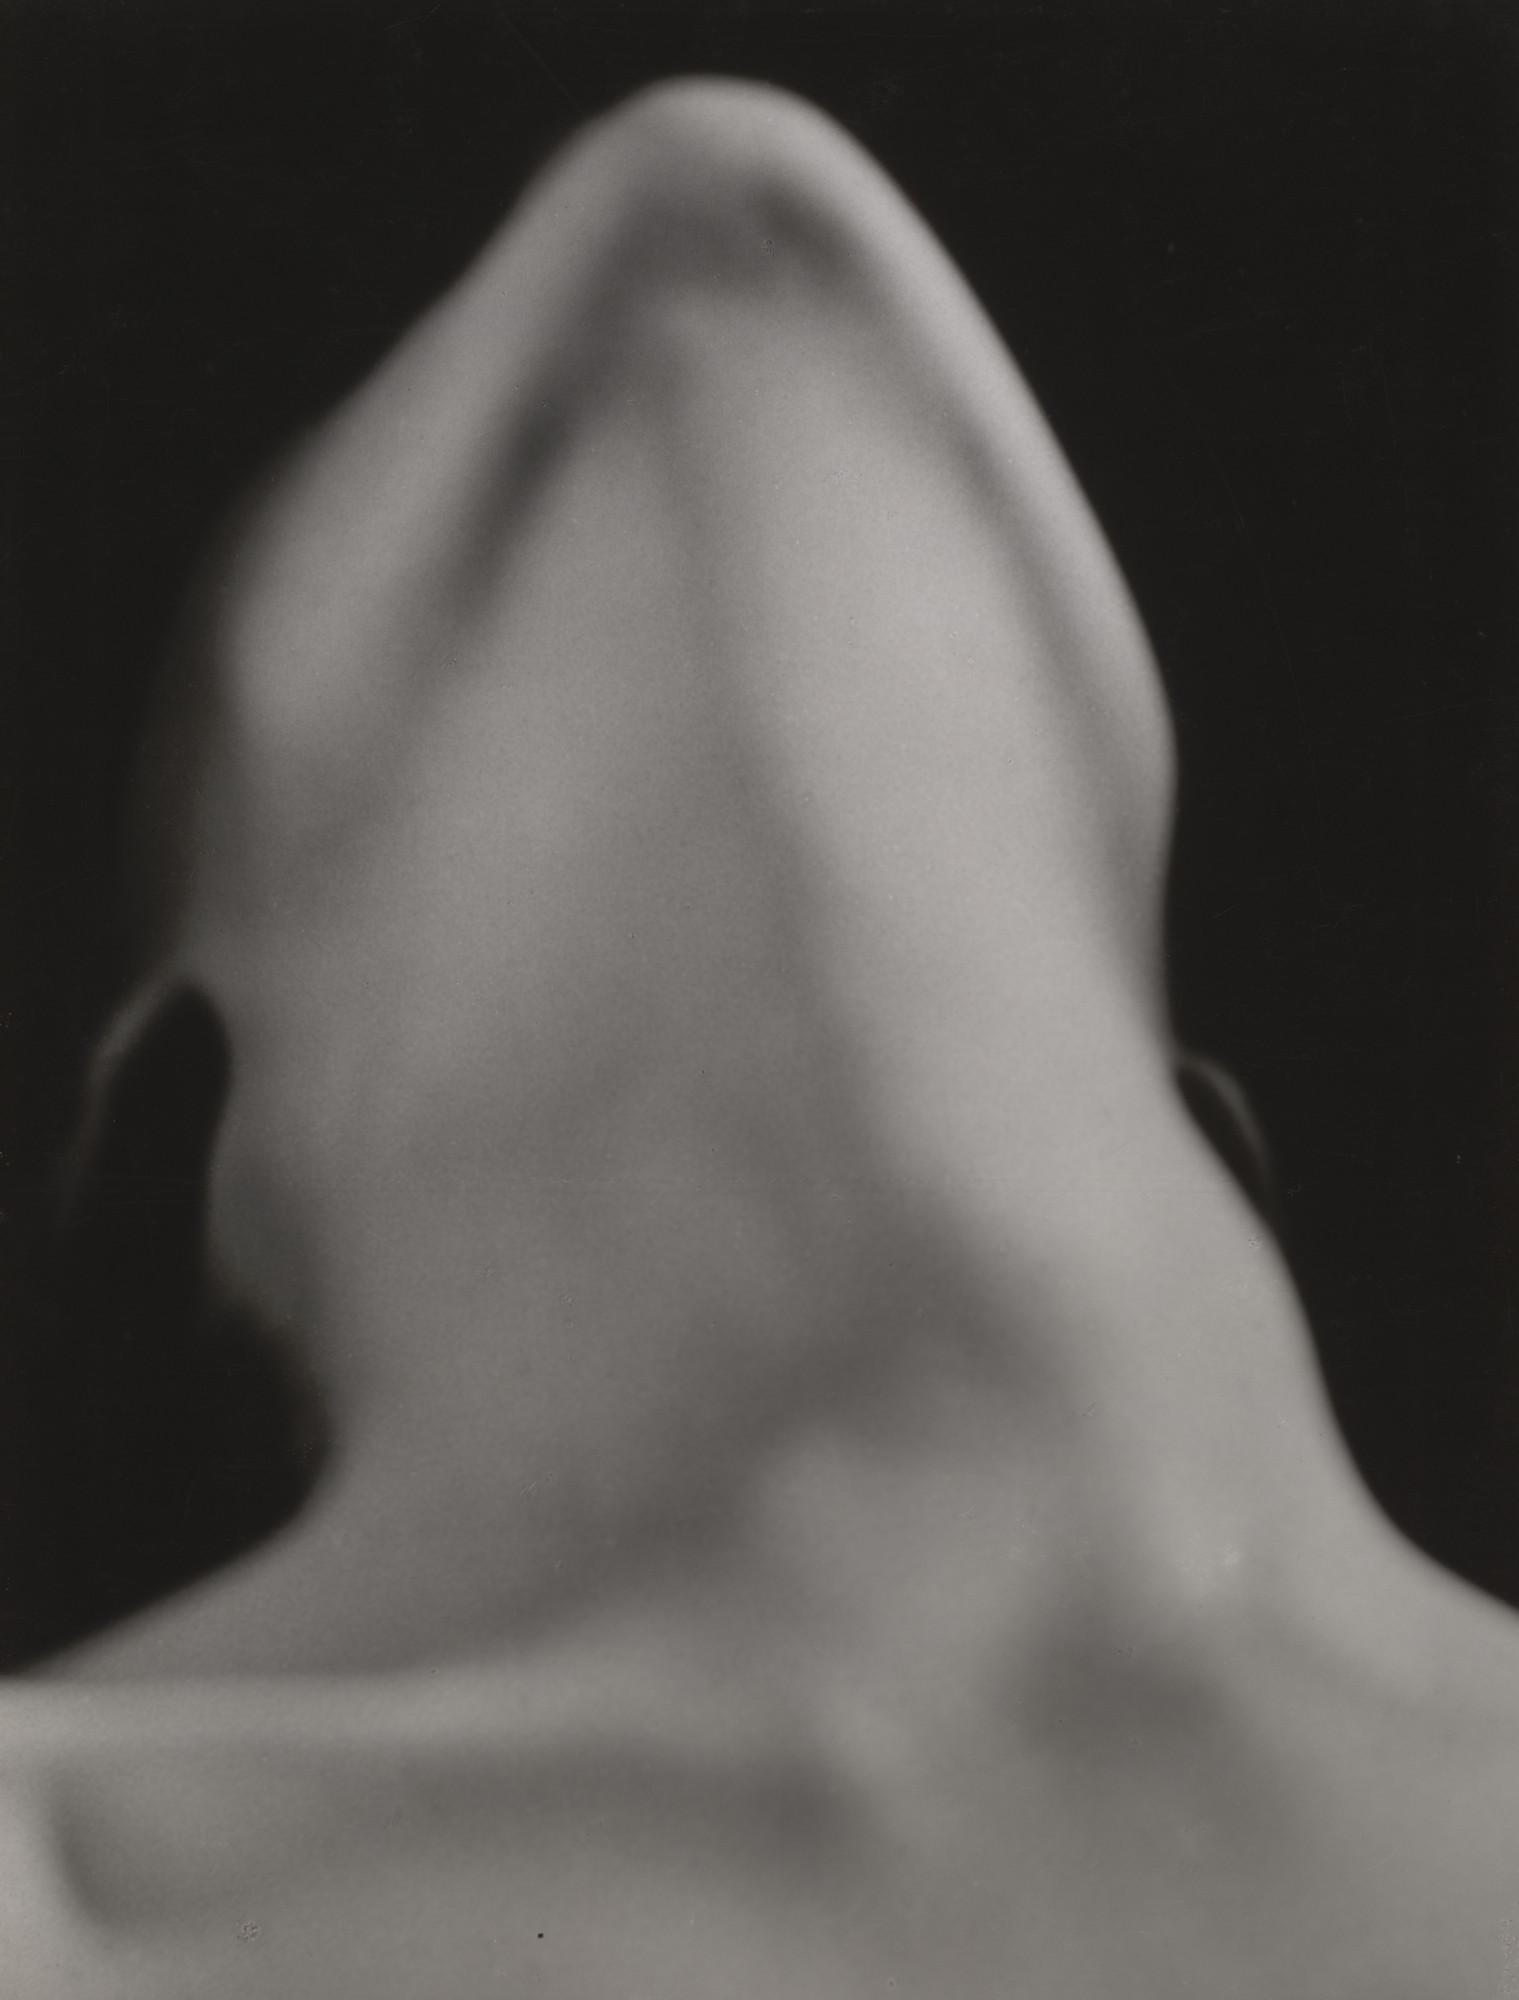 Man Ray (Emmanuel Radnitzky). Anatomies. 1929 | MoMA